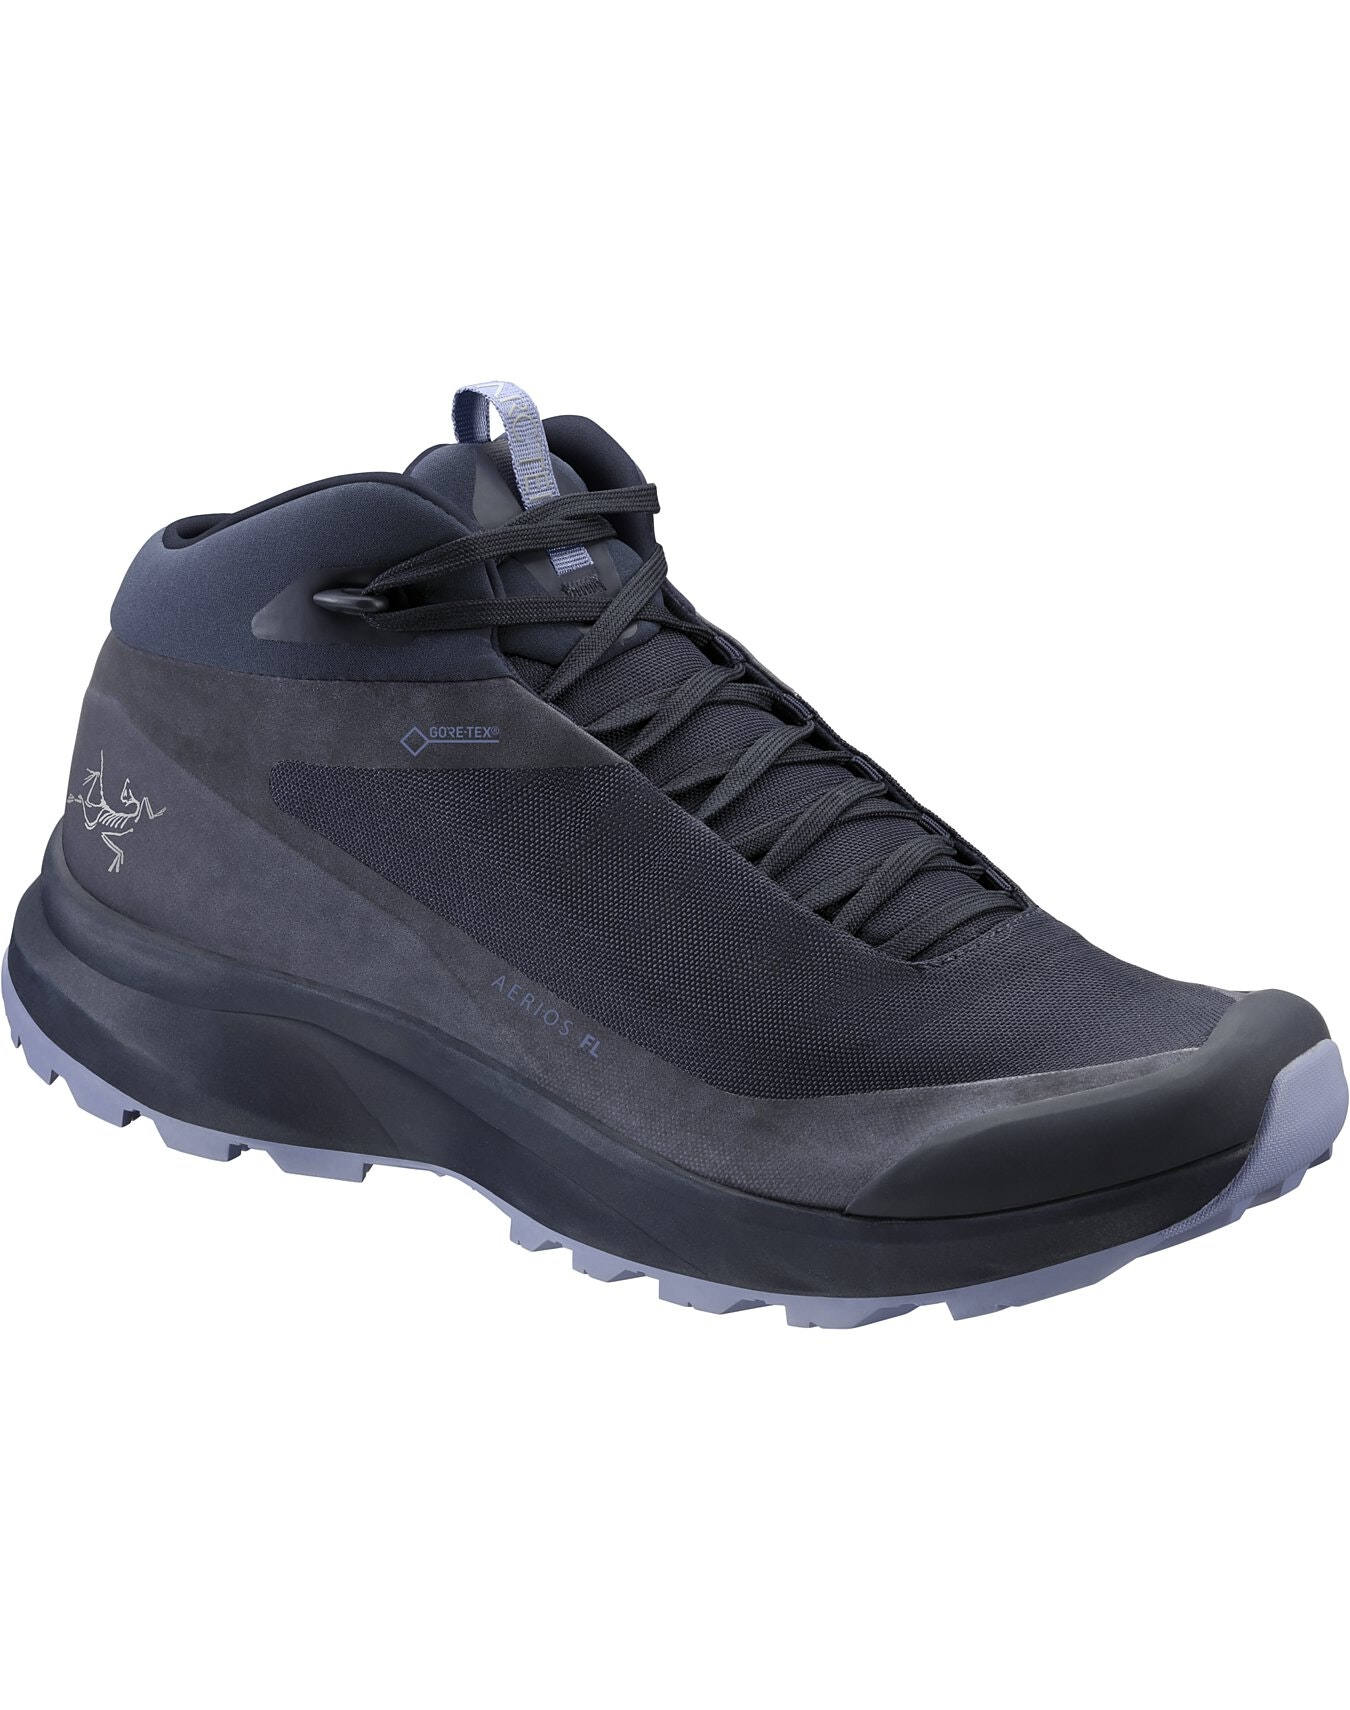 Aerios FL Mid GTX Shoe Black Sapphire/Binary